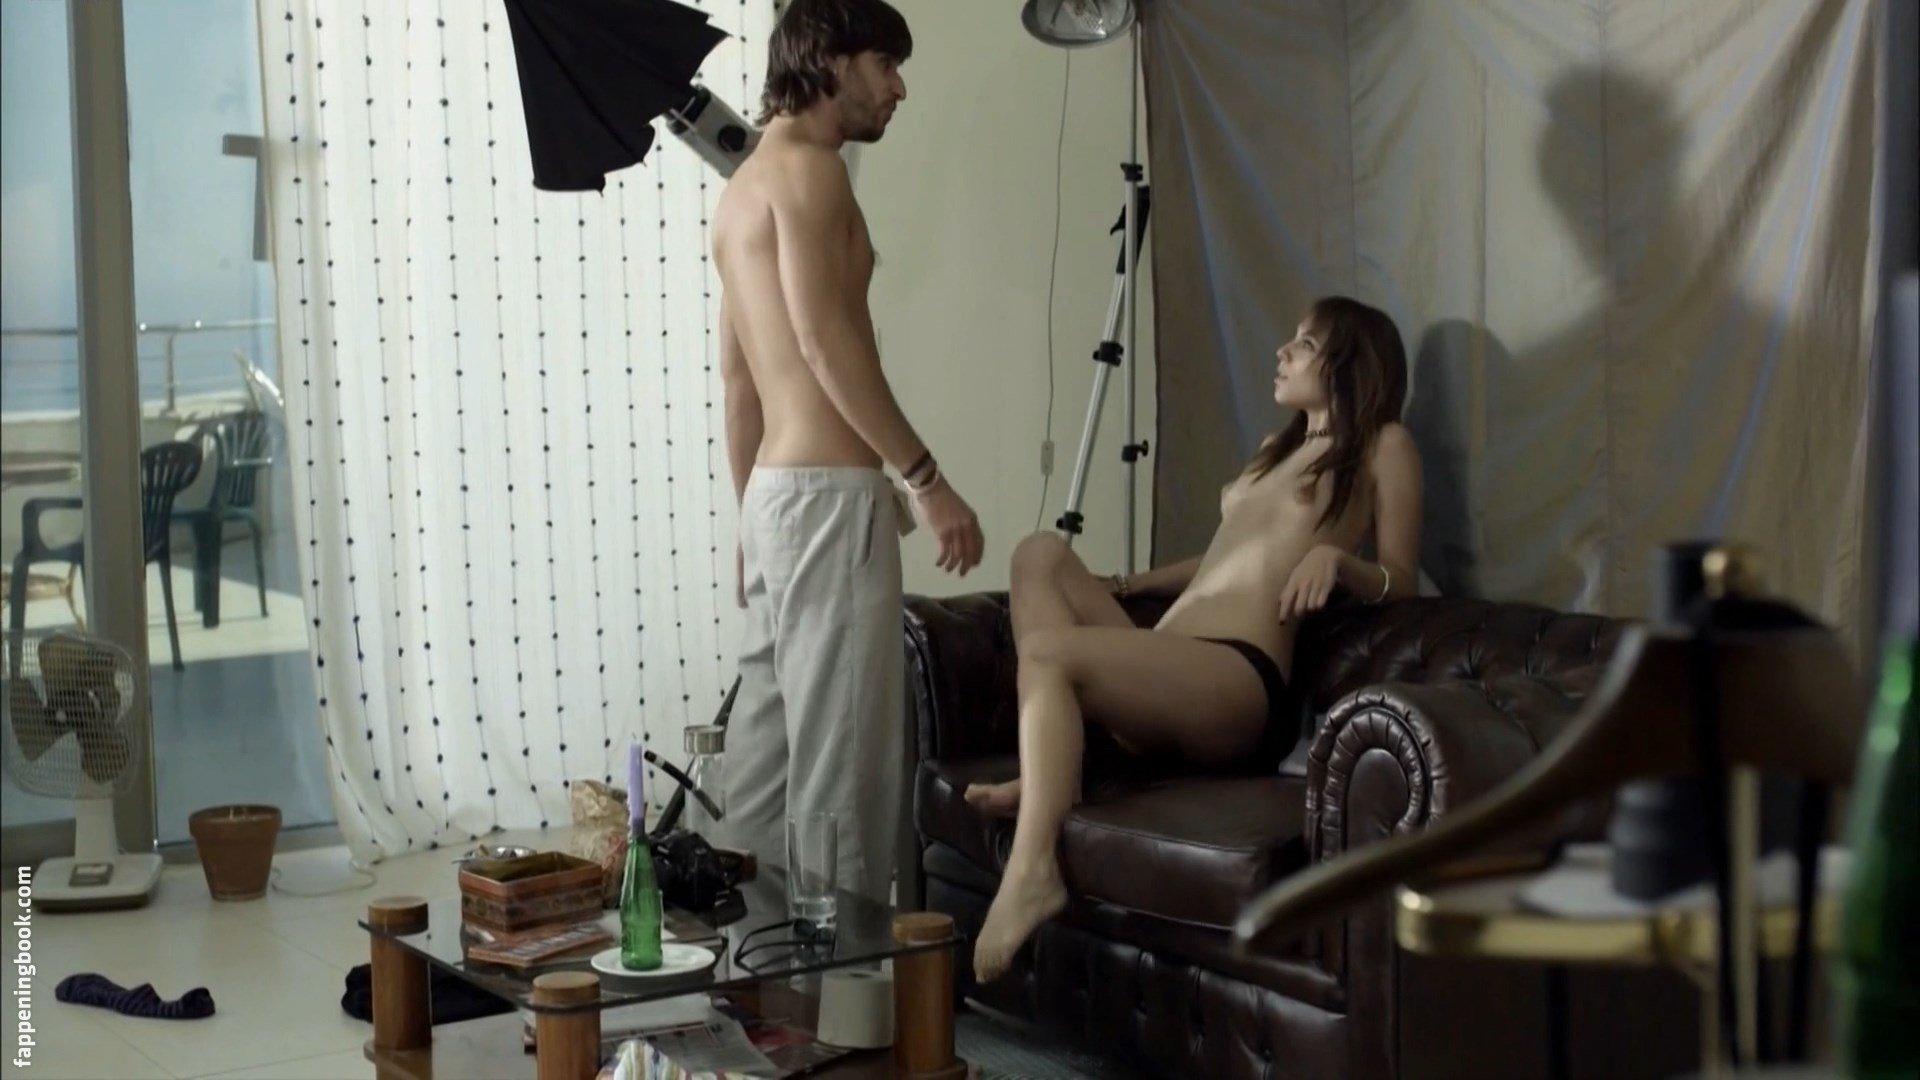 Aura Garrido Nude aura garrido nude, sexy, the fappening, uncensored - photo